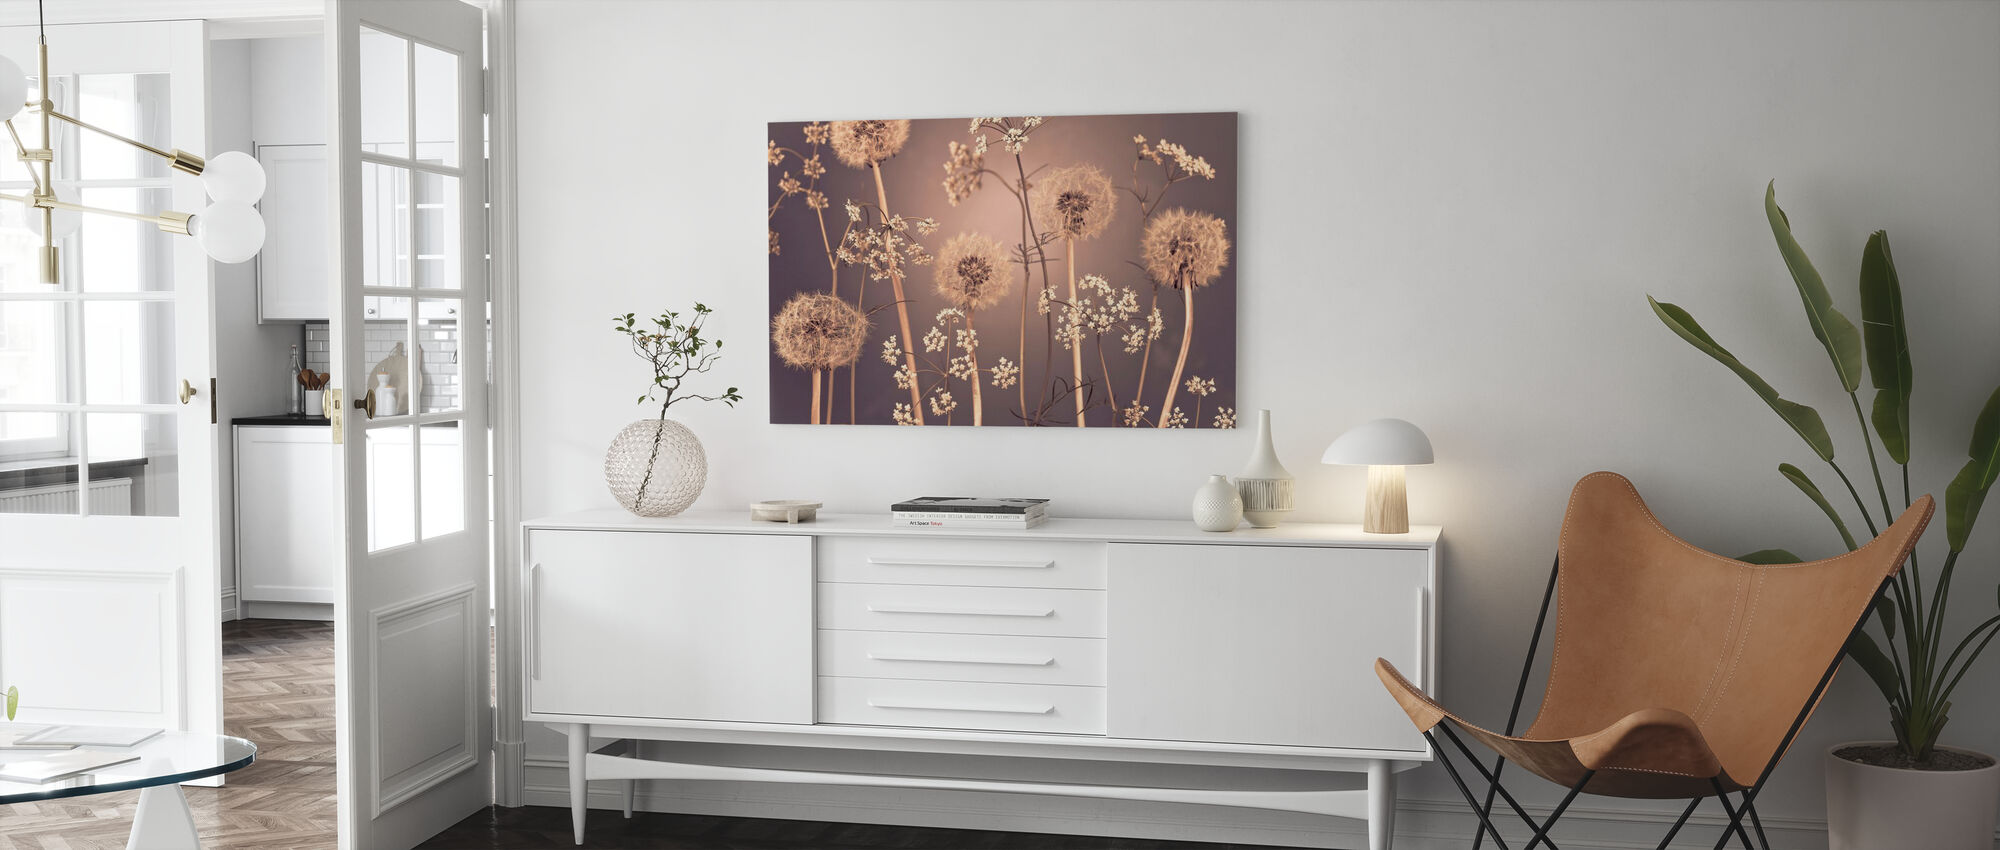 Weide Bloemen - Canvas print - Woonkamer